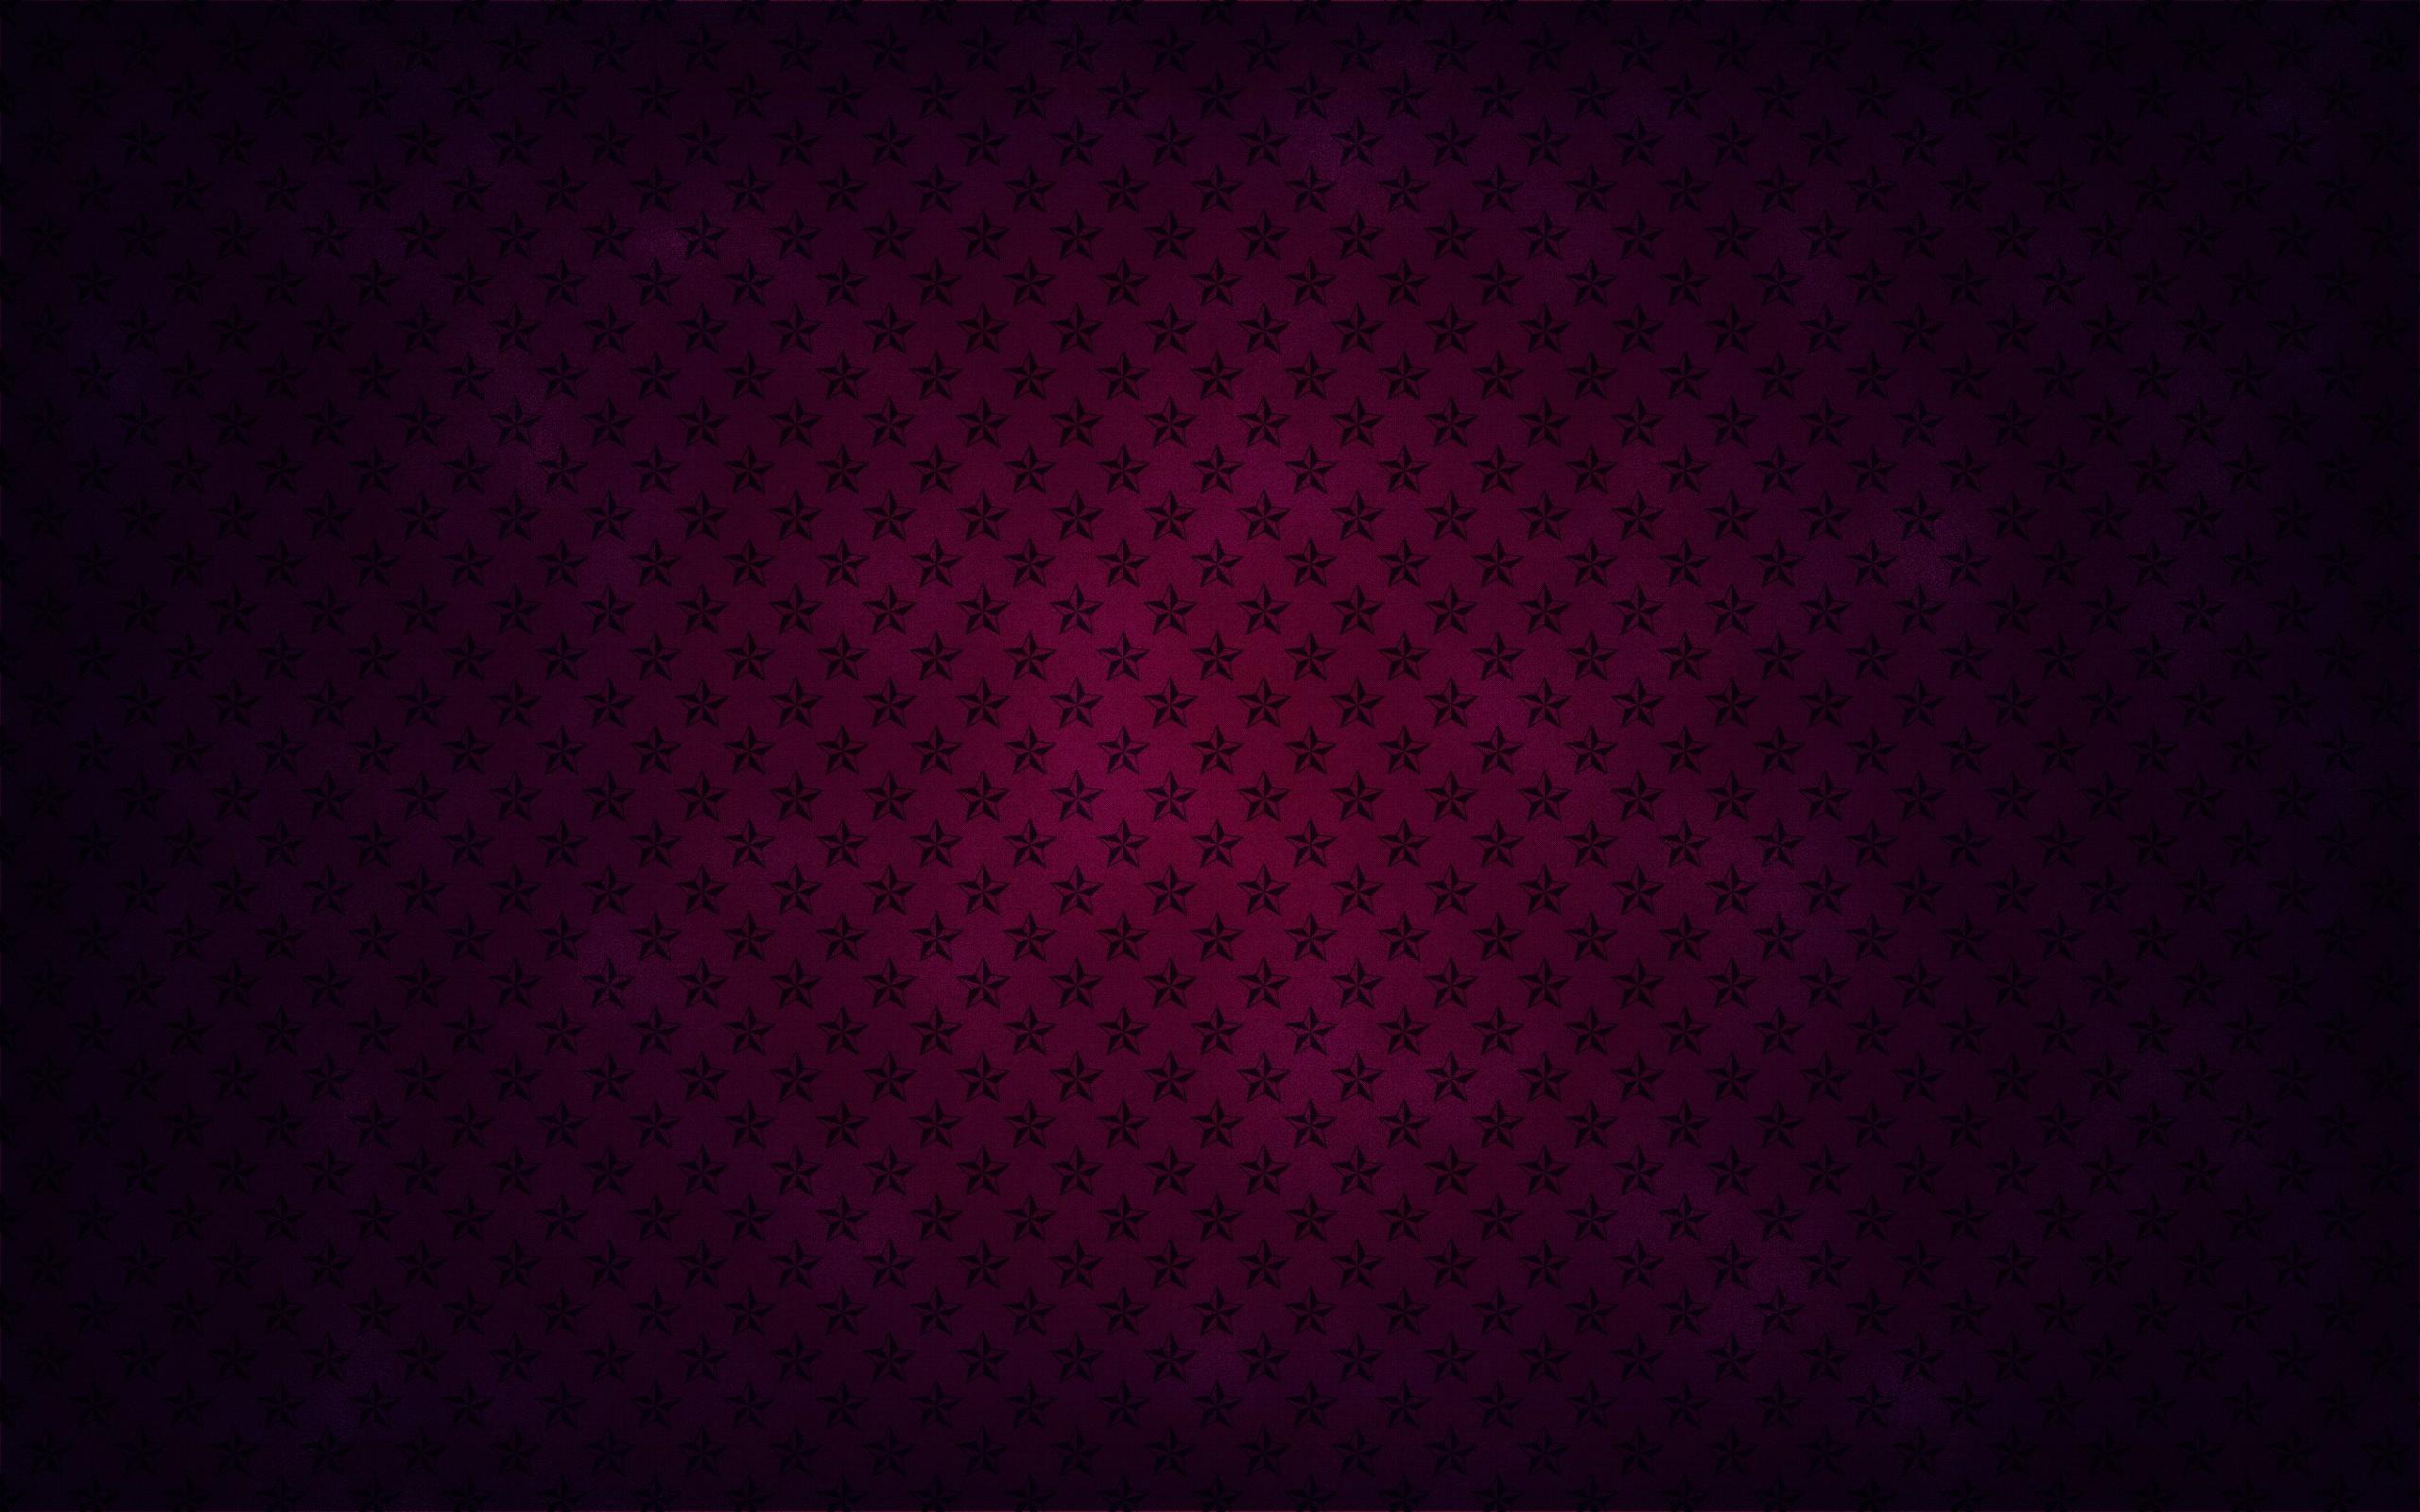 Pink Plain Background